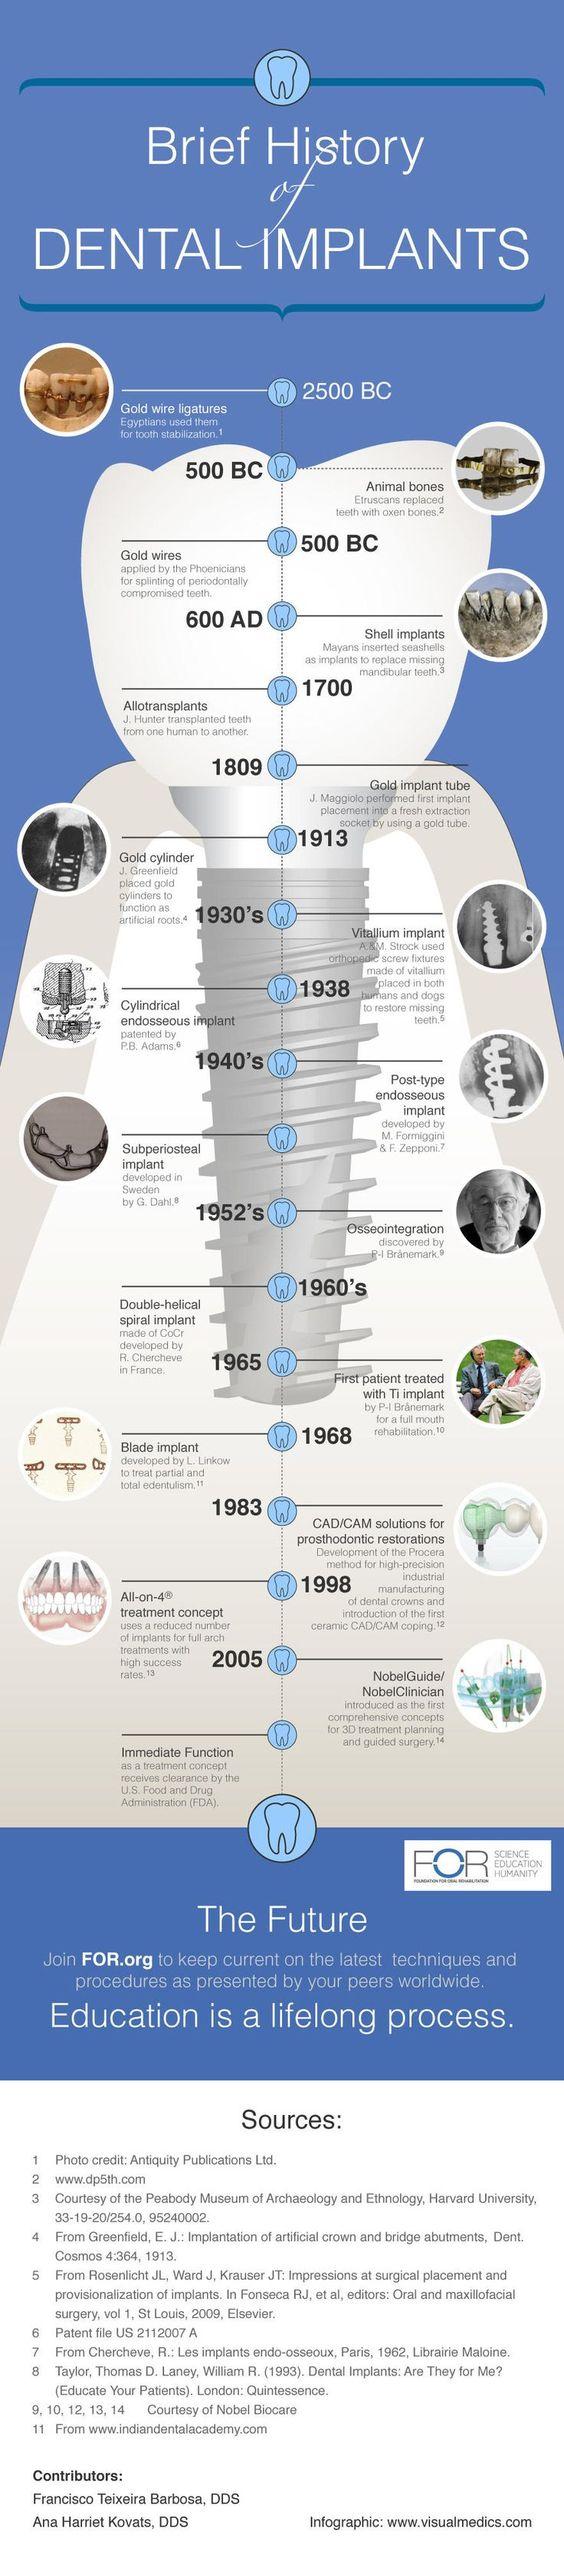 history of implants